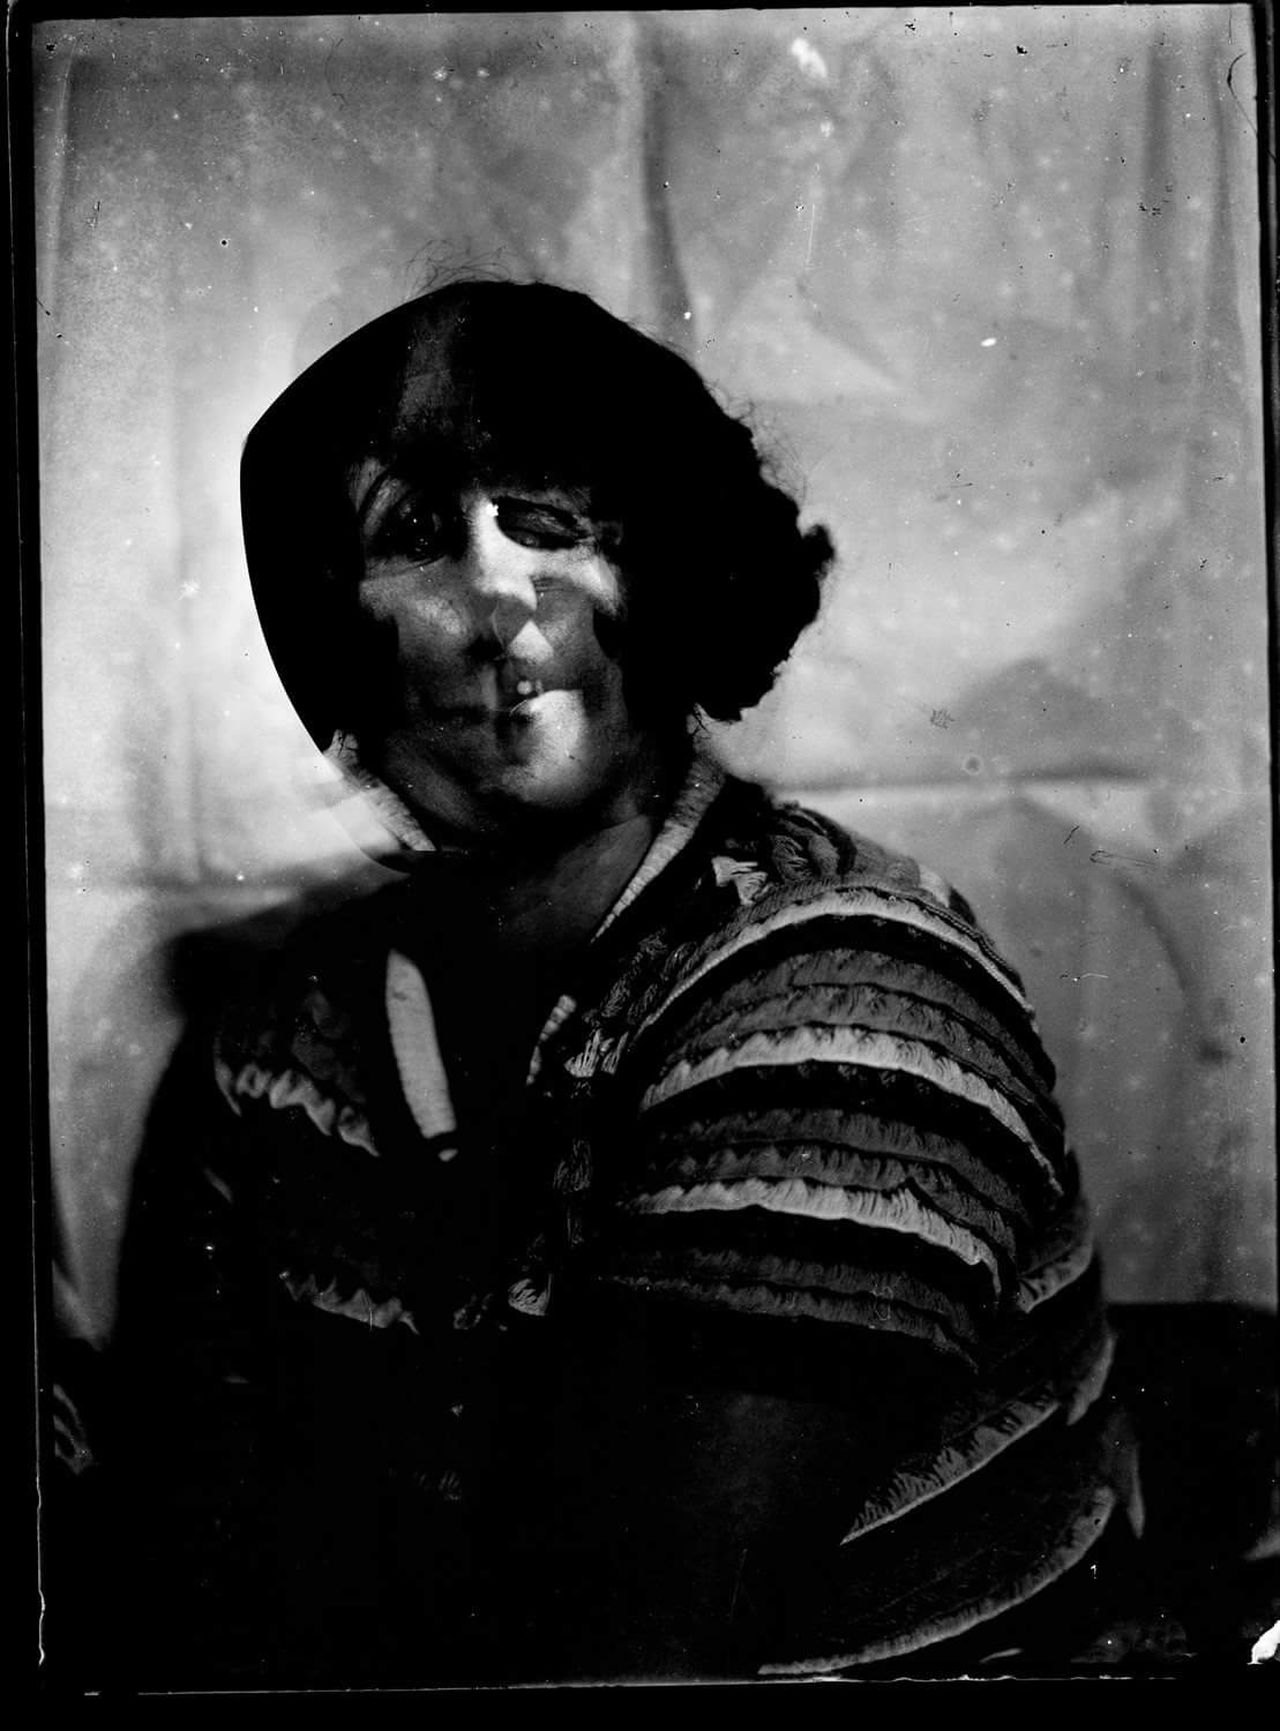 Monster Blackandwhite Vintage Portrait Art